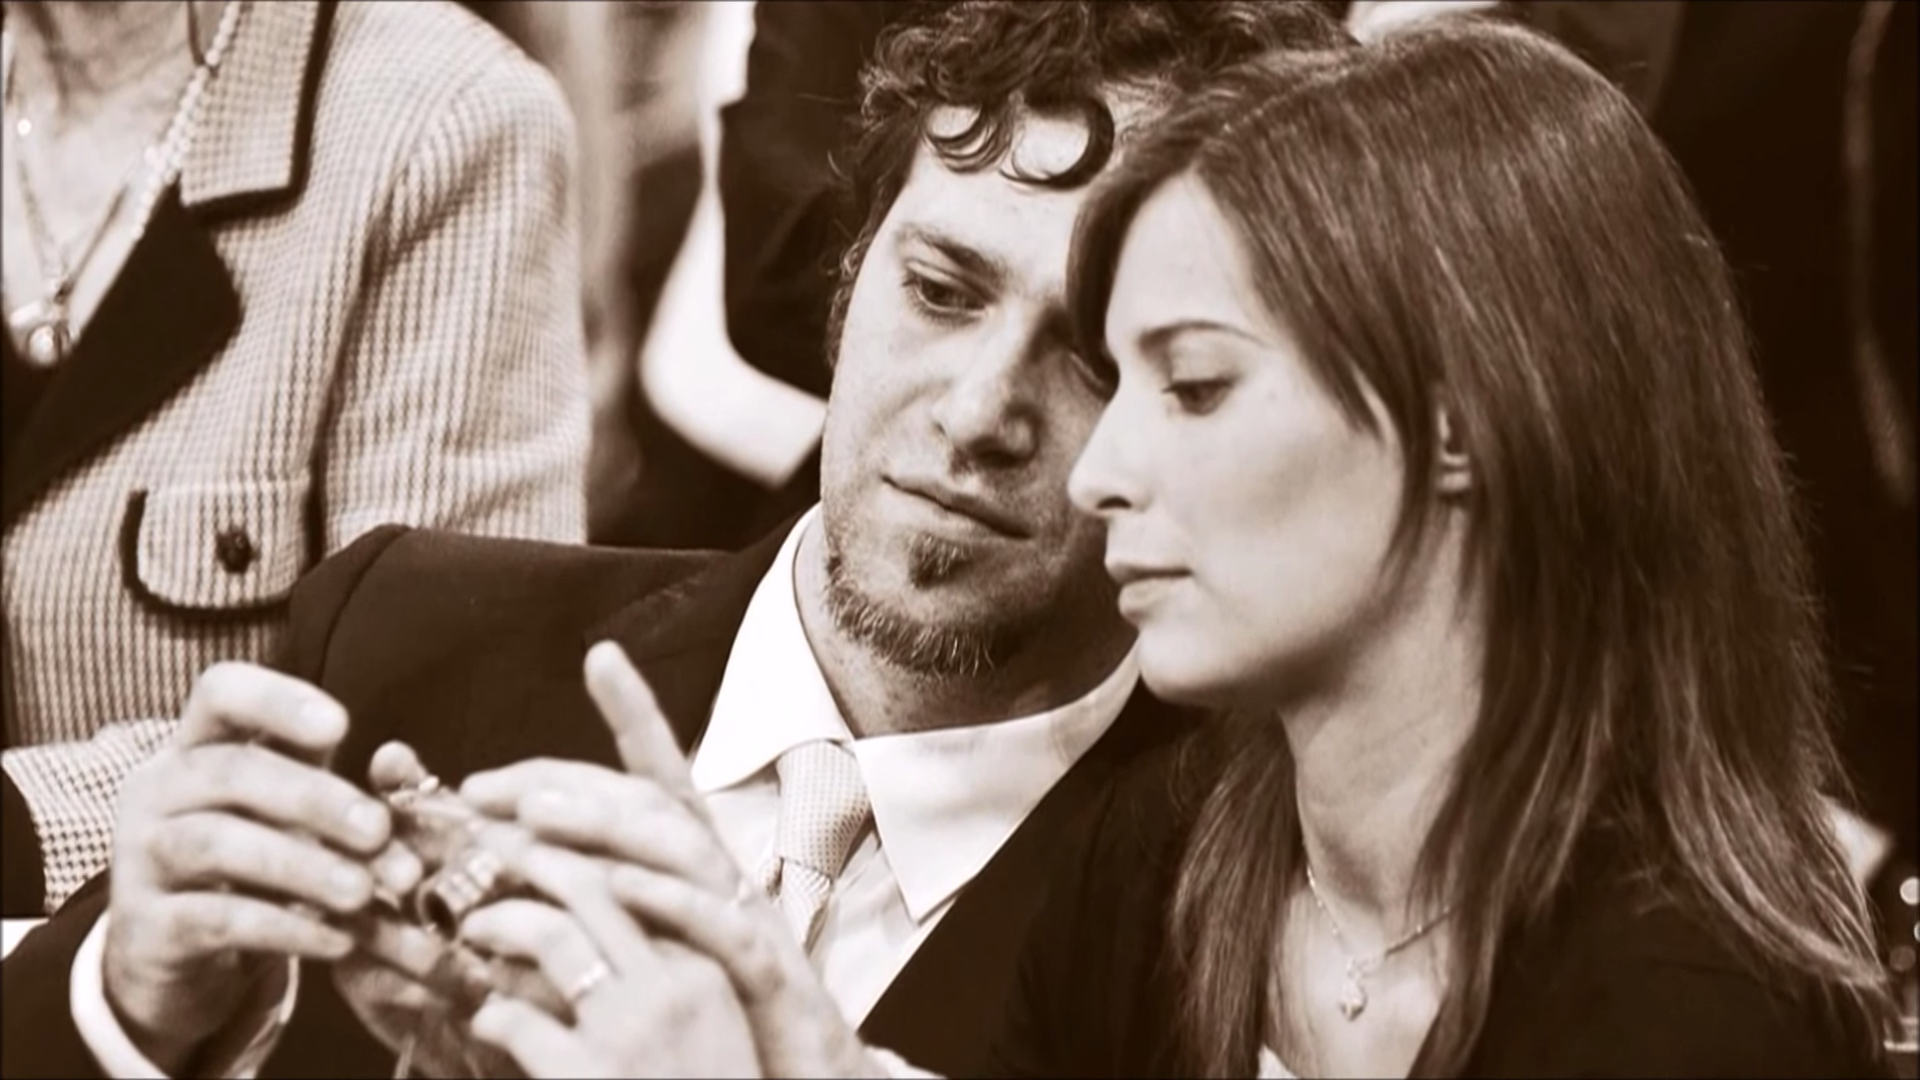 Chiara Corbella et son mari, Enrico Petrillo, capture YouTube